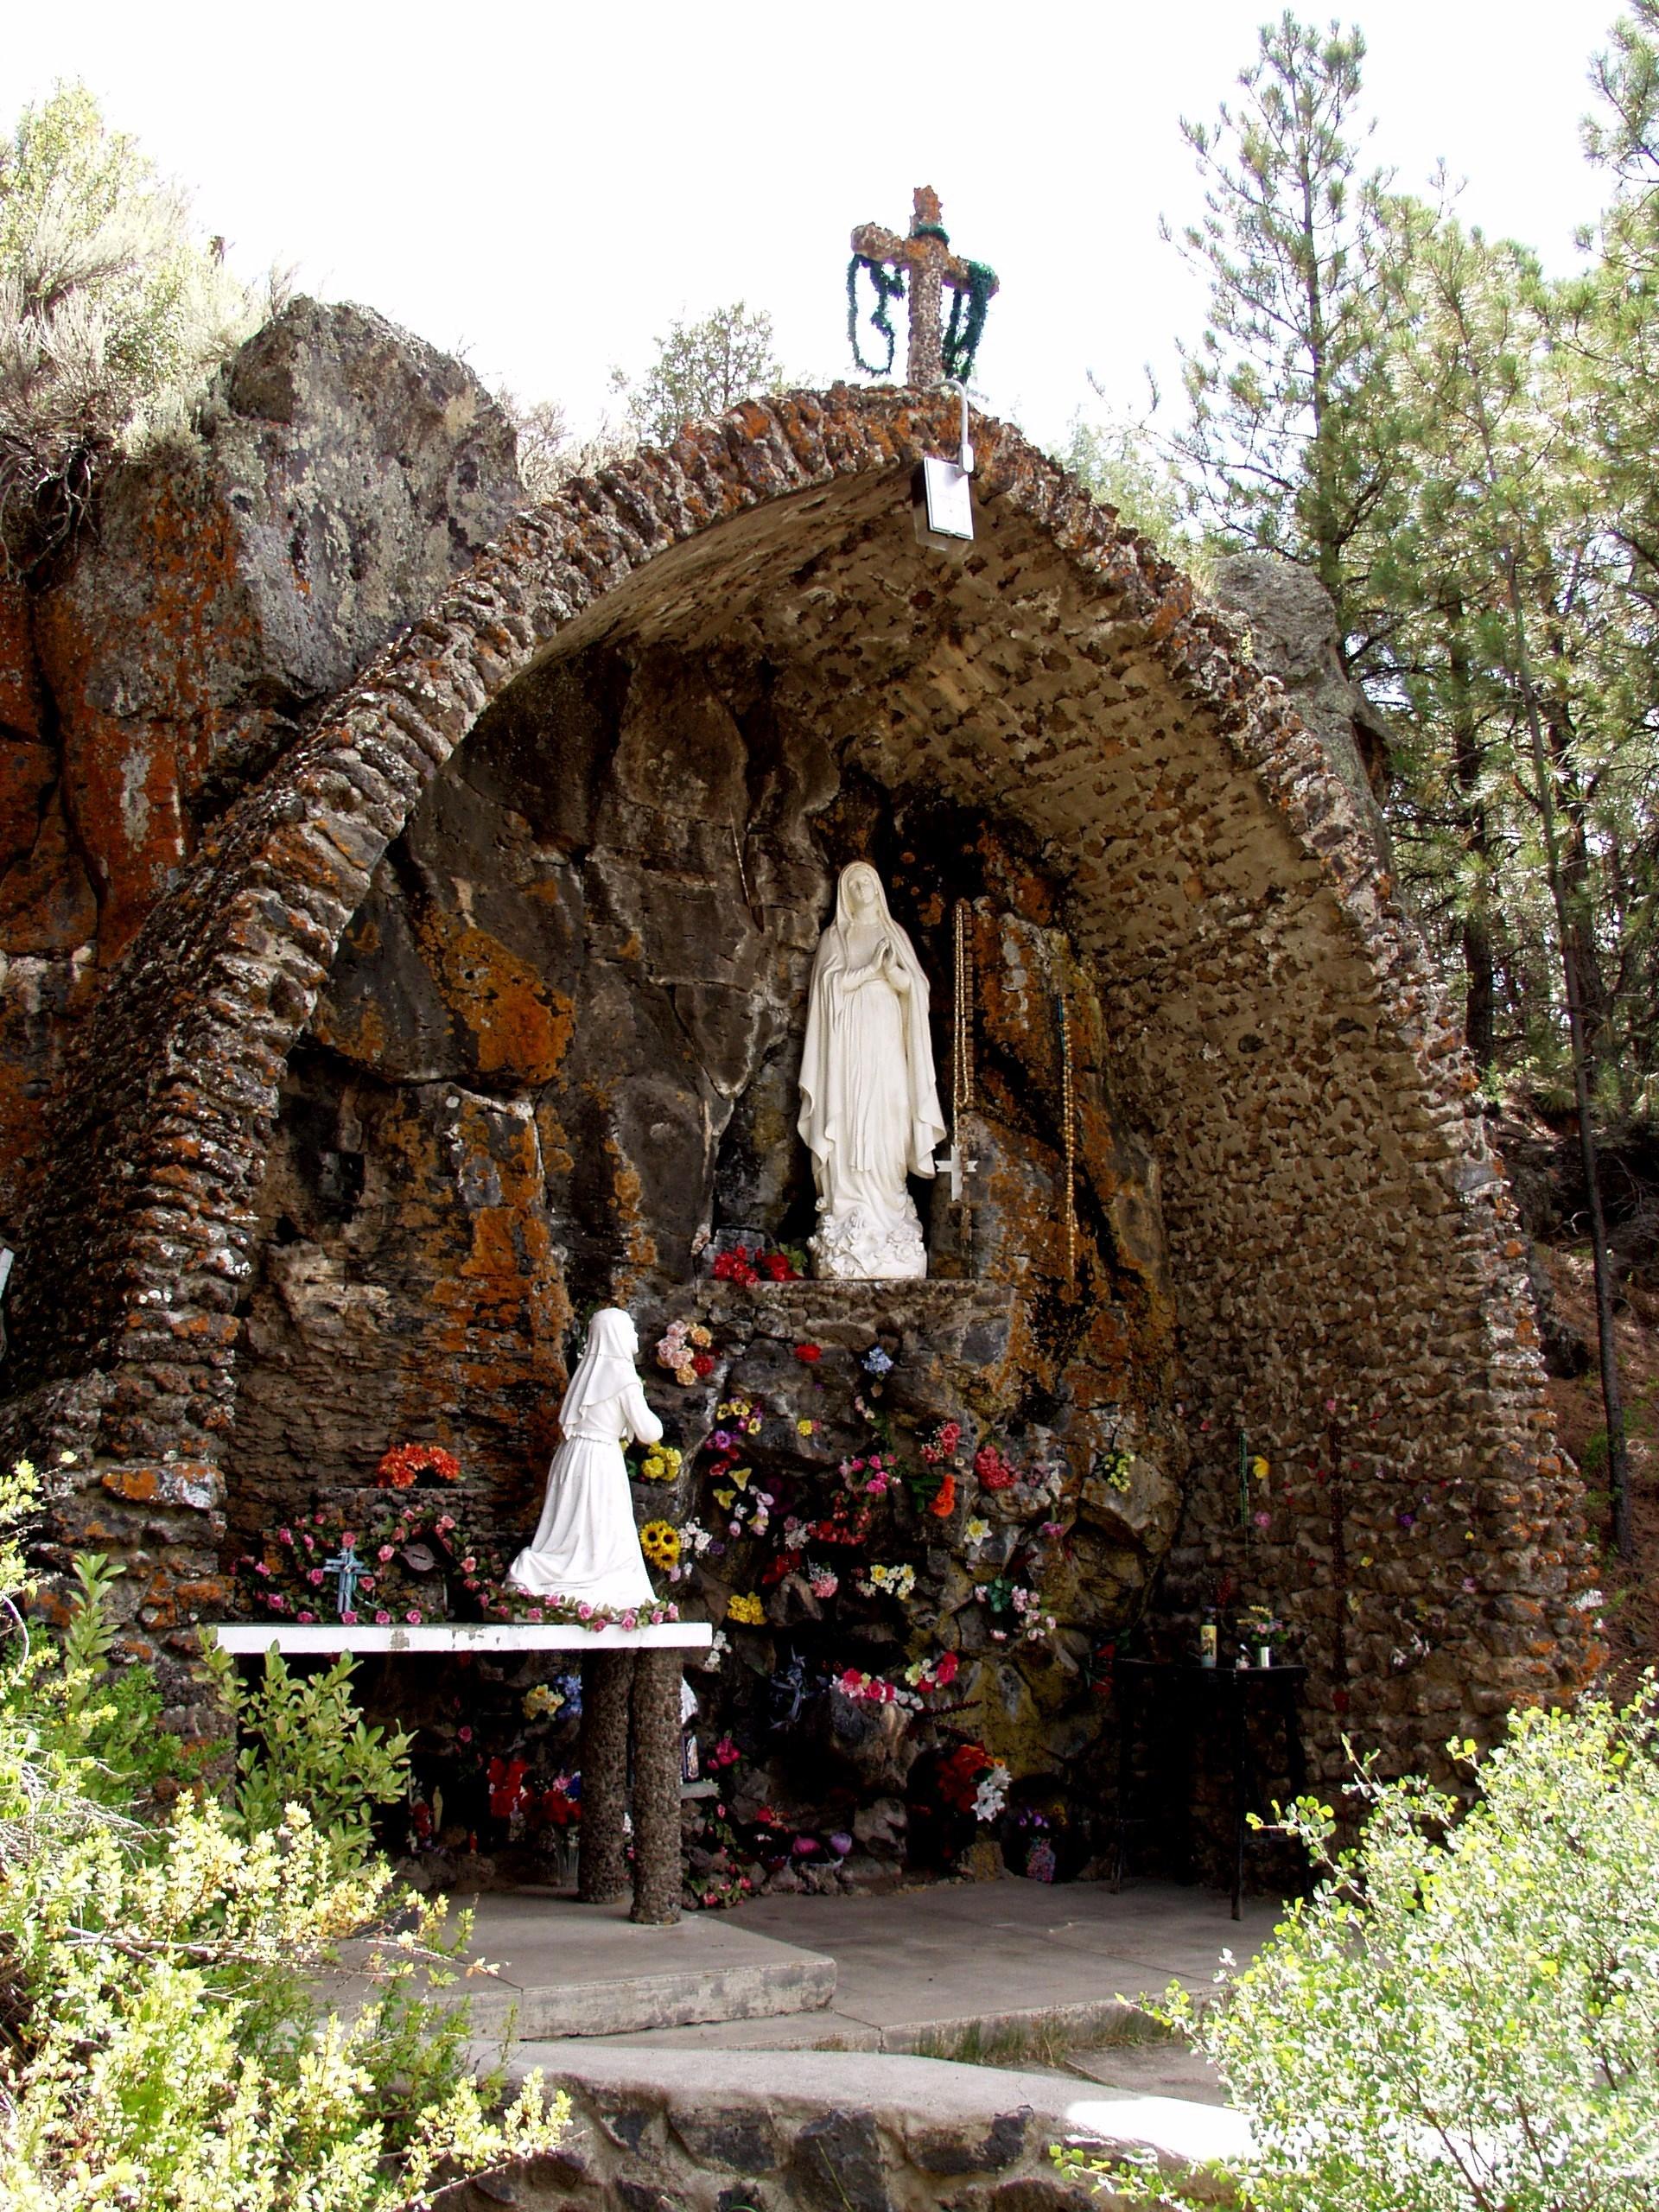 The St. Bernadette Grotto in Los Ojos, NM